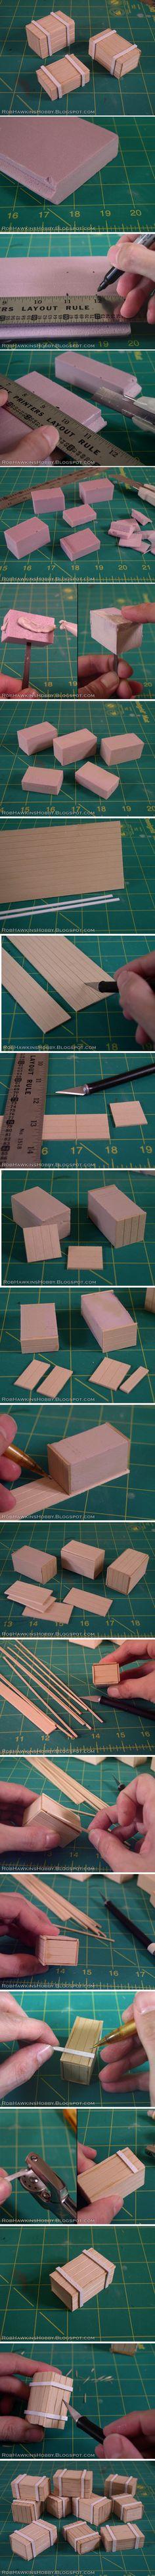 Tutorial de caixas